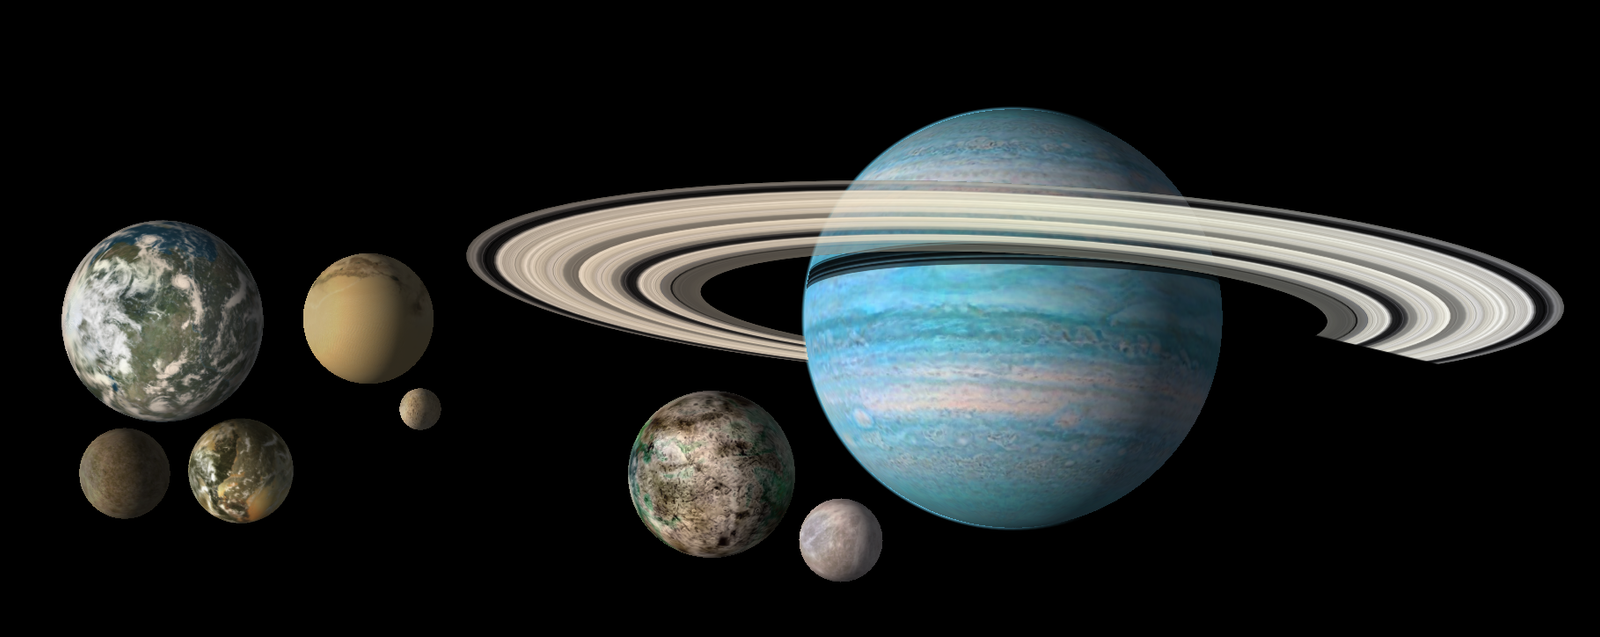 Alpha Centauri B Baahki System by BinaryRising on DeviantArt